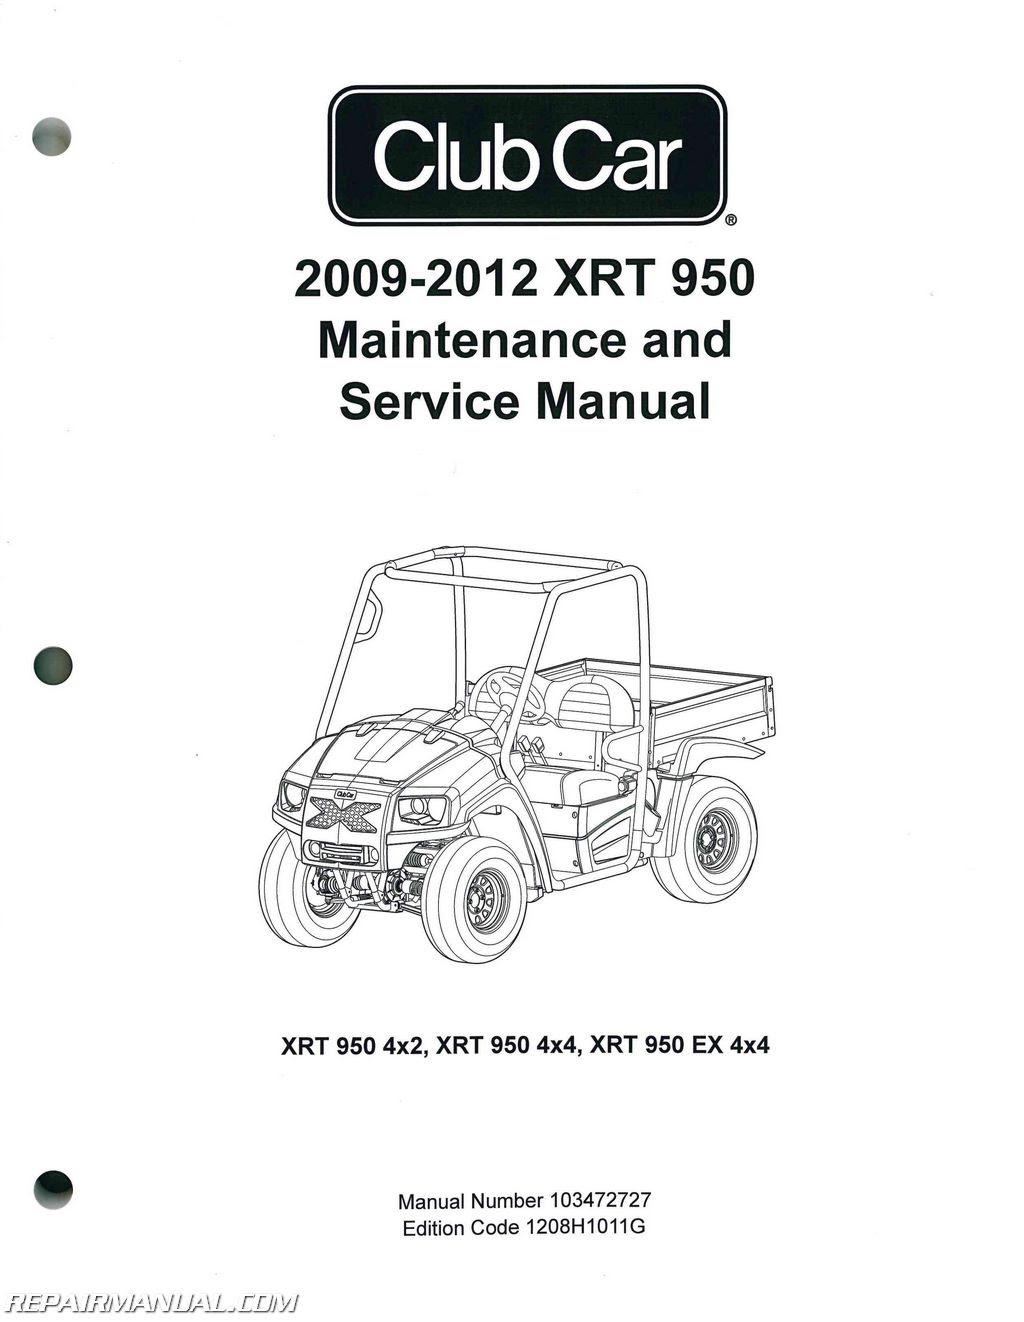 2009-2012 Club Car XRT 950 Maintenance Golf Cart Service ...